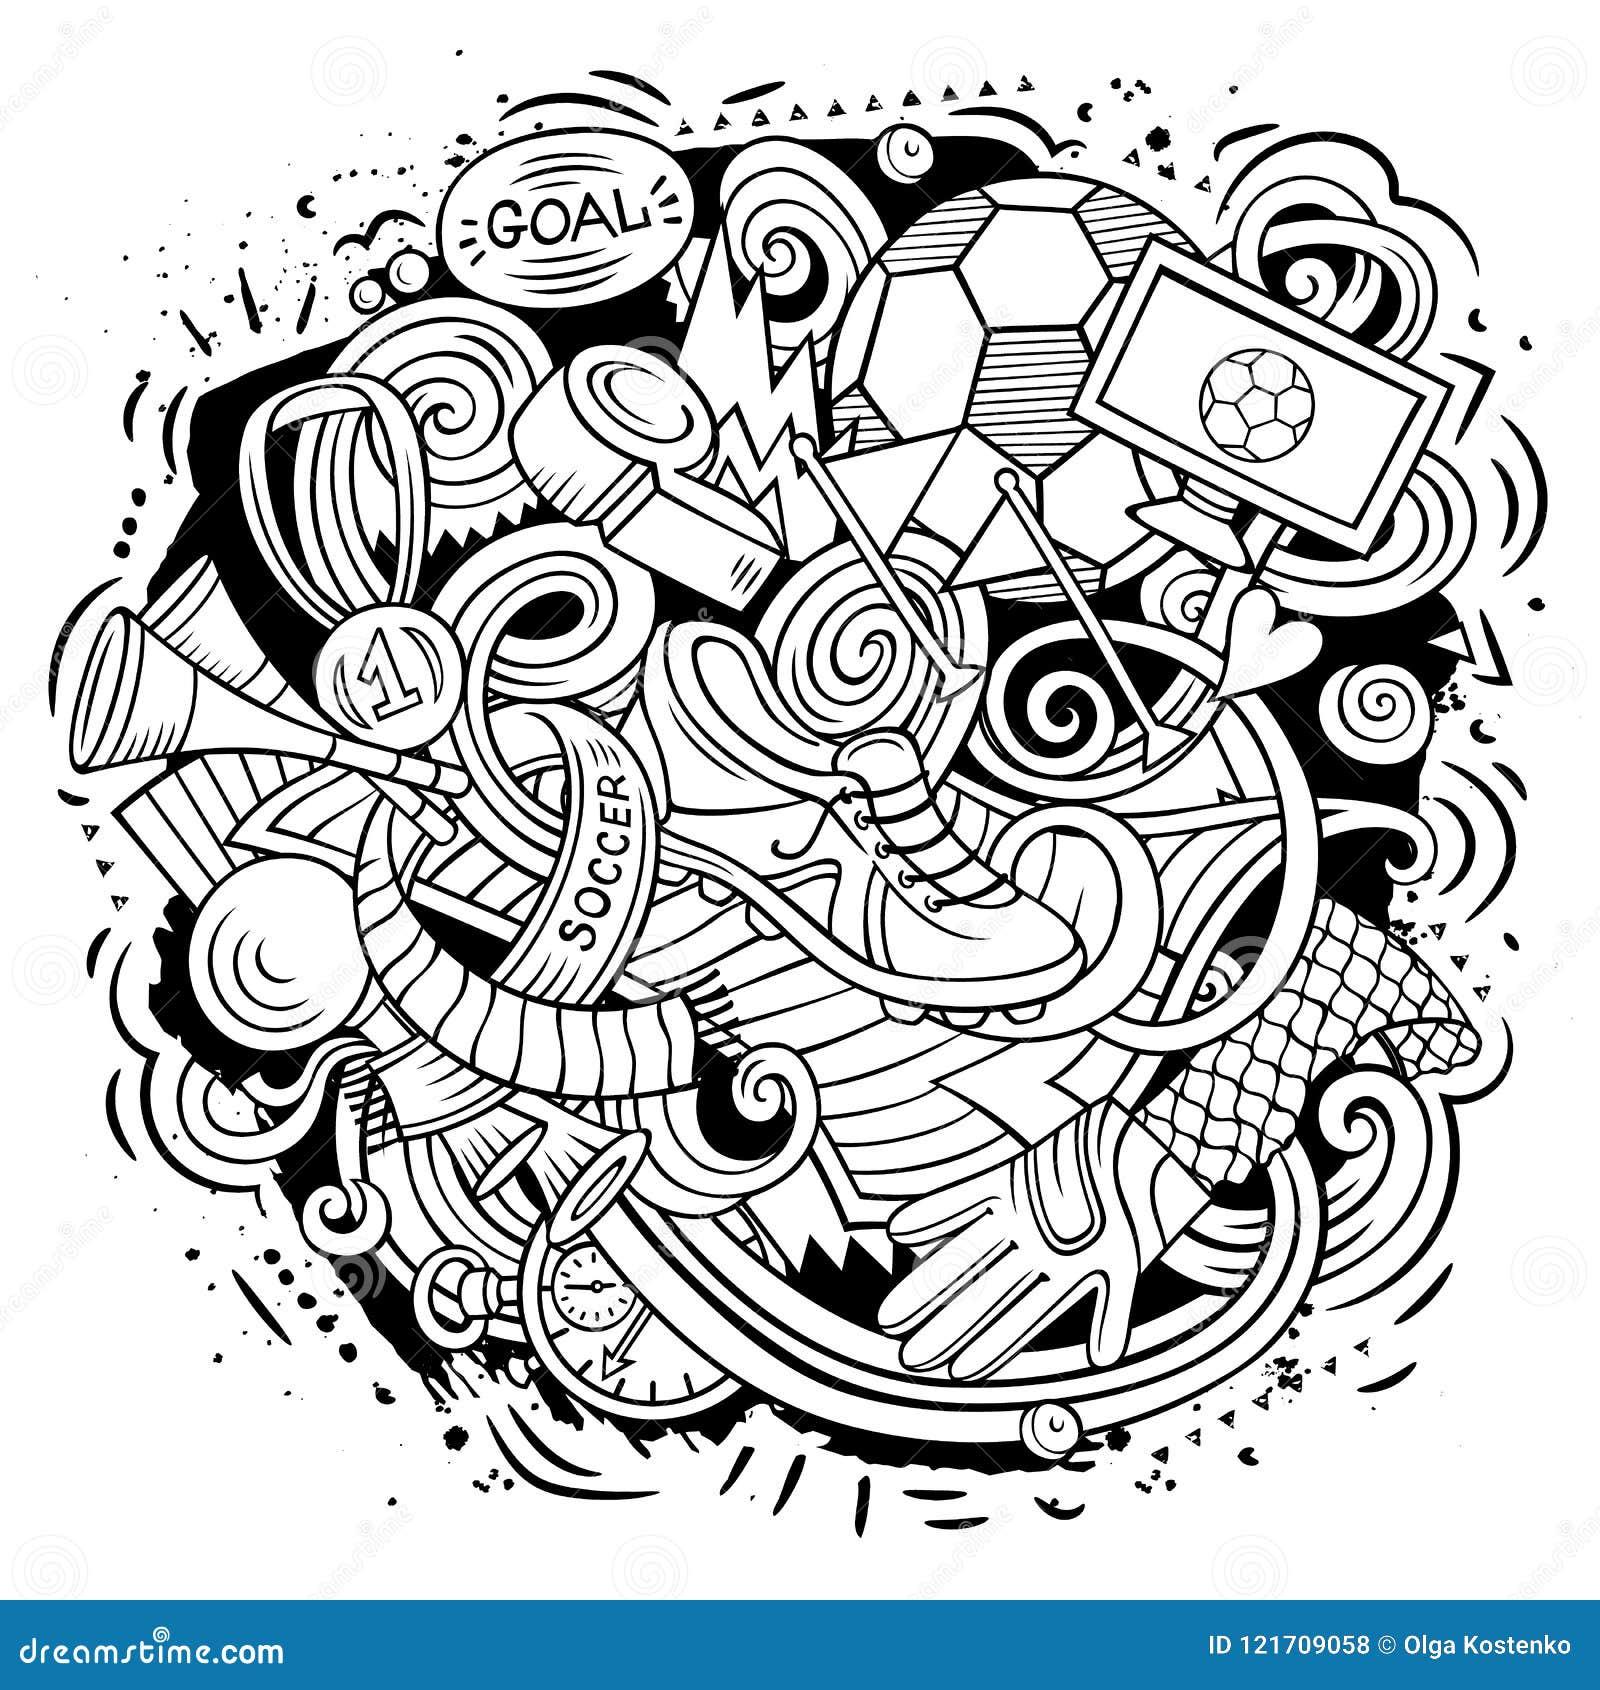 Cool Football Doodle Art